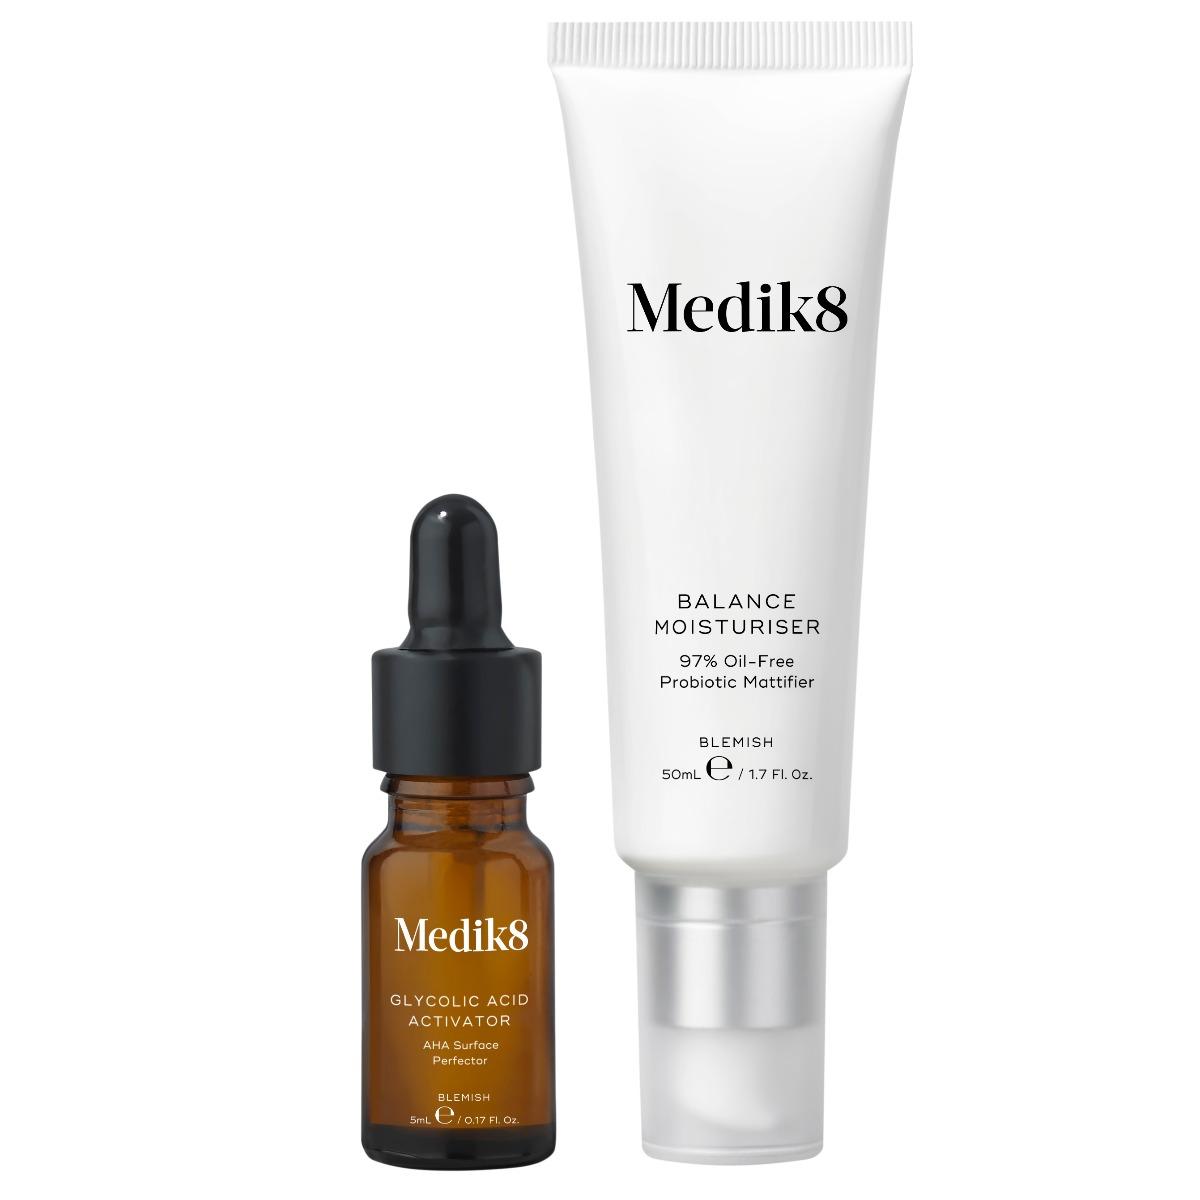 Medik8 Balance Moisturiser & Glycolic Acid Activator 55ml